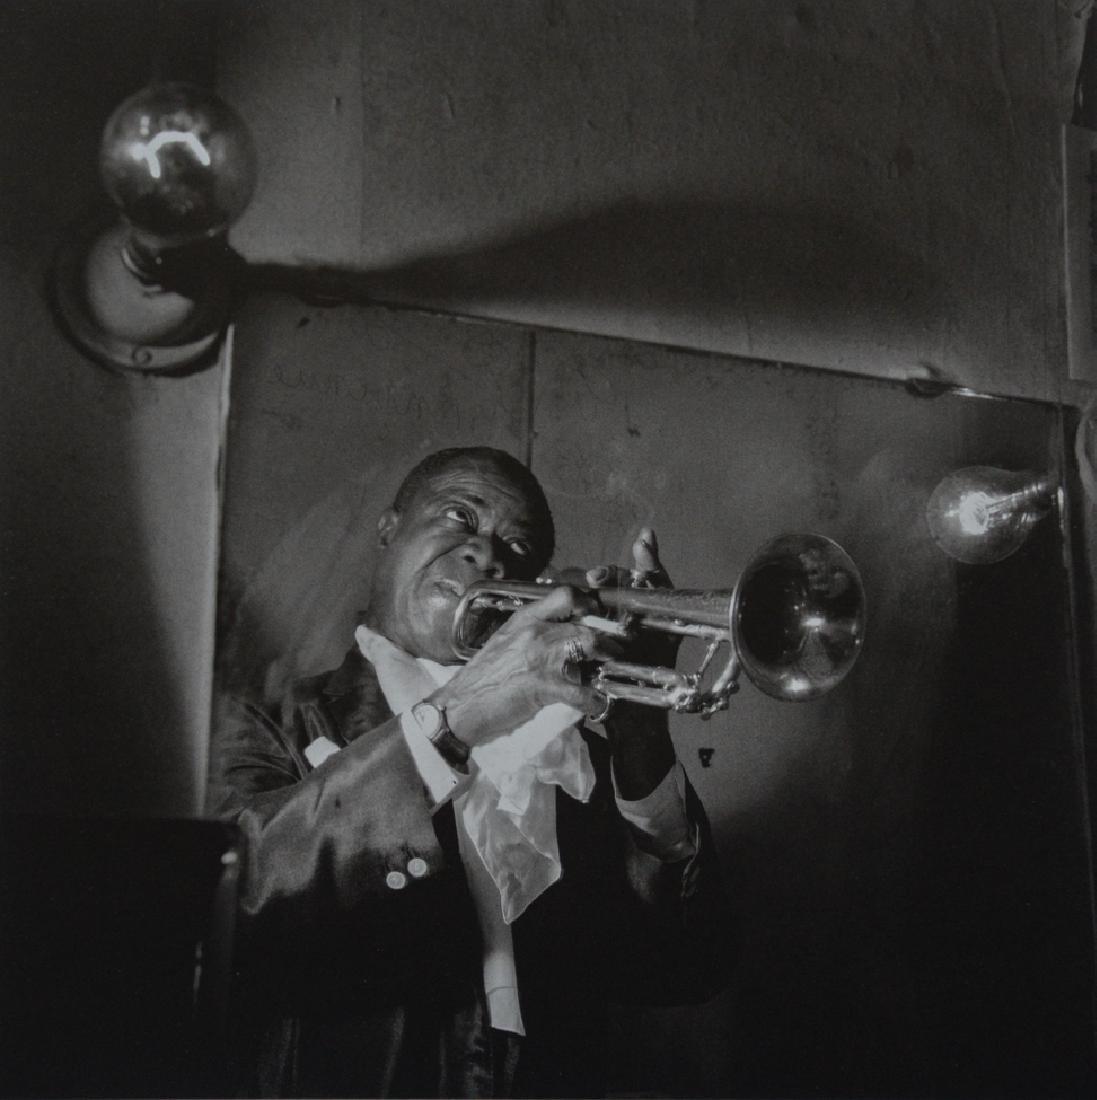 JEANLOUP SIEFF - Louis Armstrong, Paris, 1955